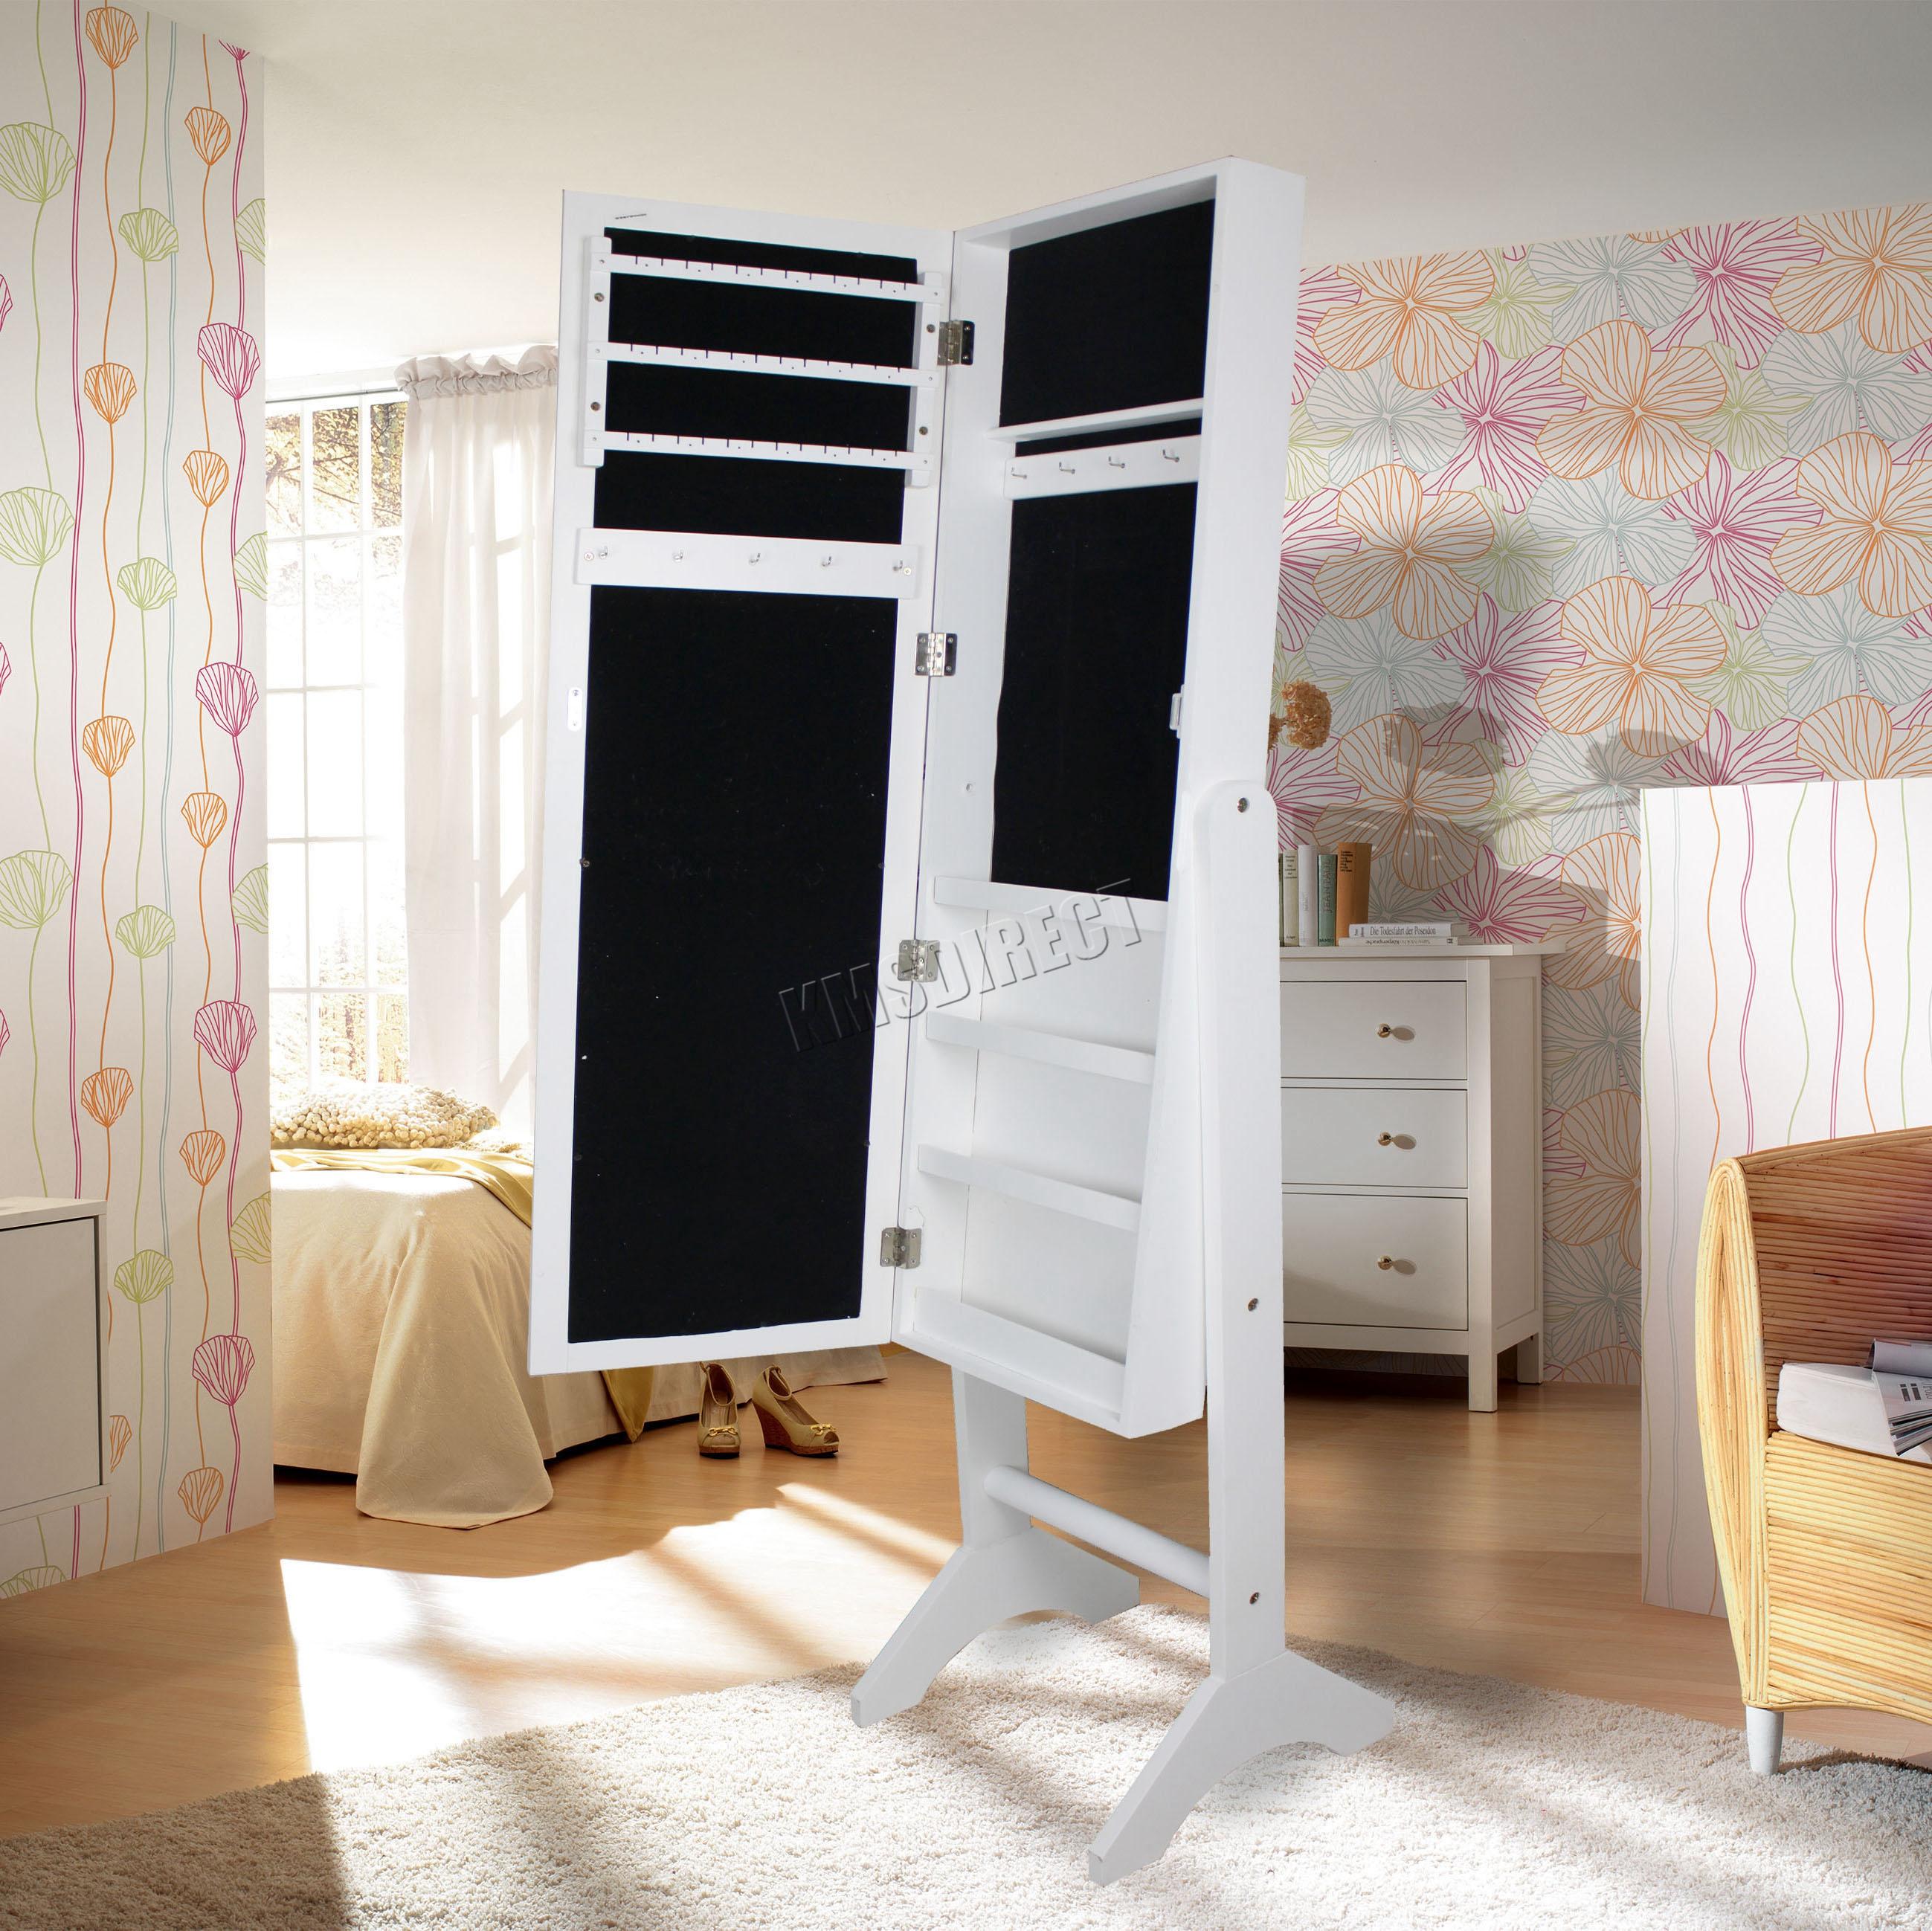 WestWood-Armoire-Jewellery-Cabinet-Storage-Standing-Jewelry-With-Mirror-MJC01